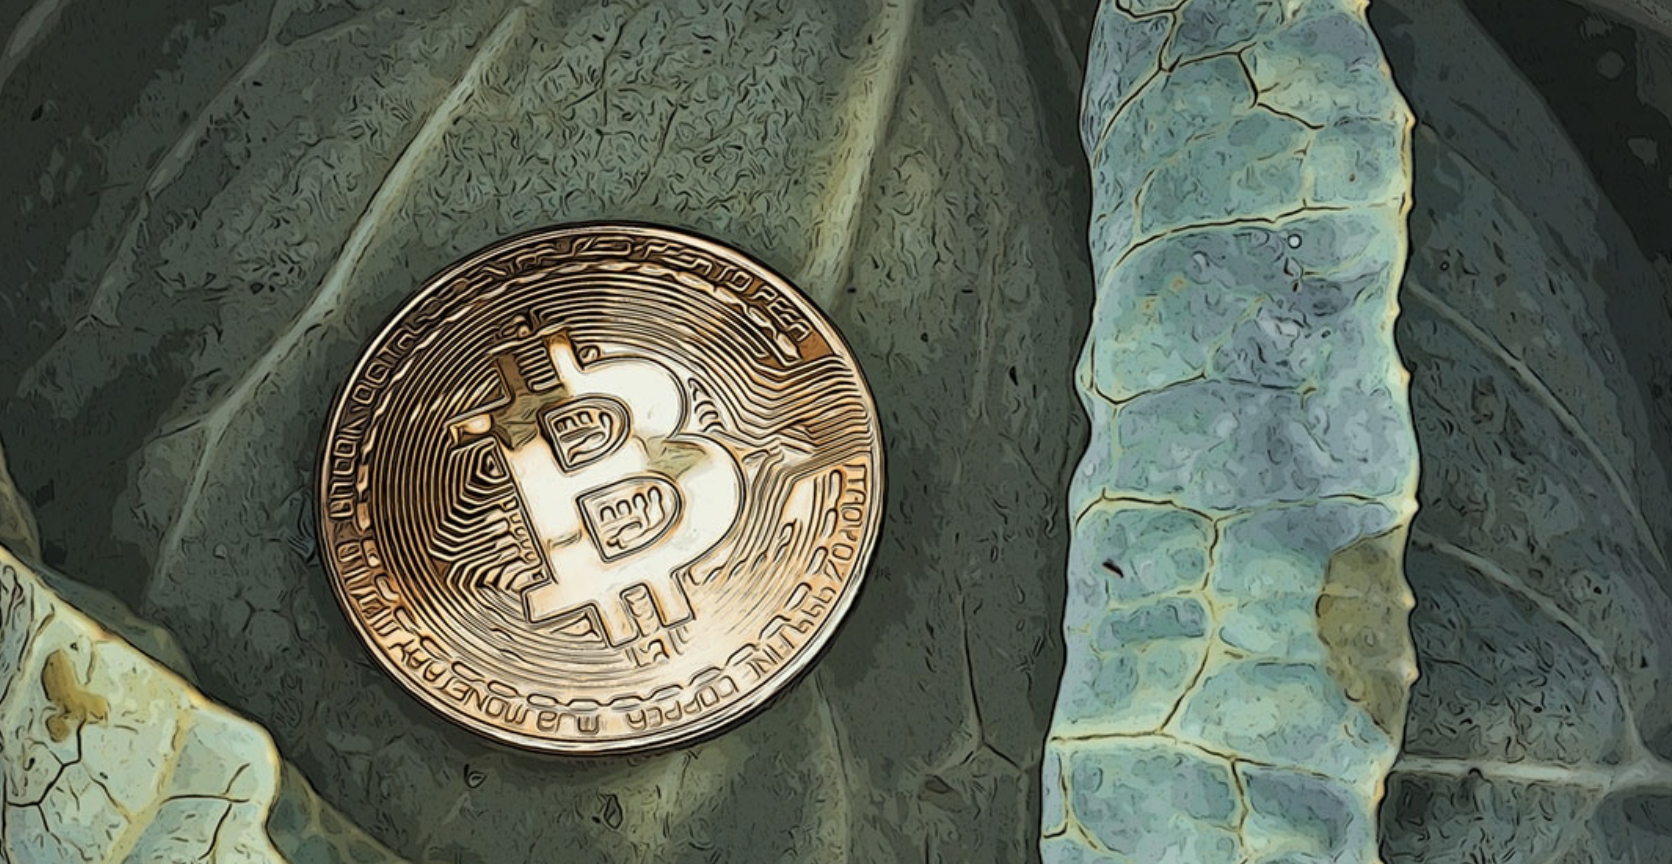 Bitcoin satin al sinyali kopya